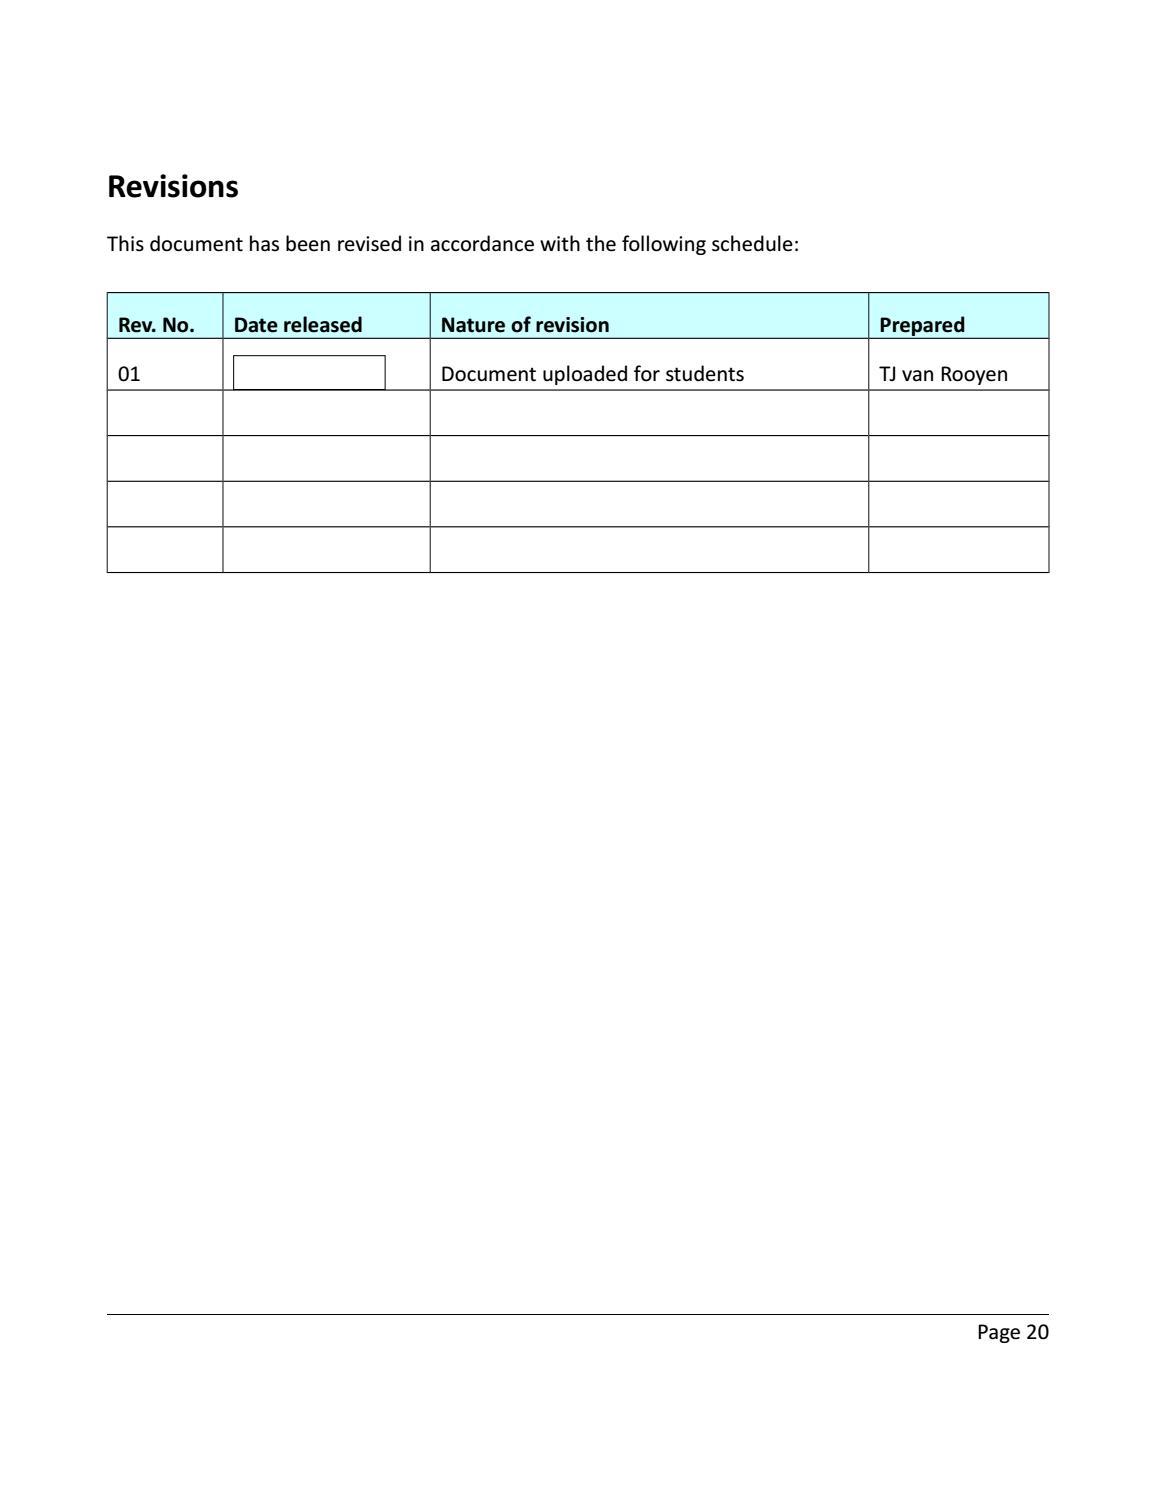 RADIOACTIVE WASTE: COMPUTATIONAL CHARACTERISATION and SHIELDING page 20